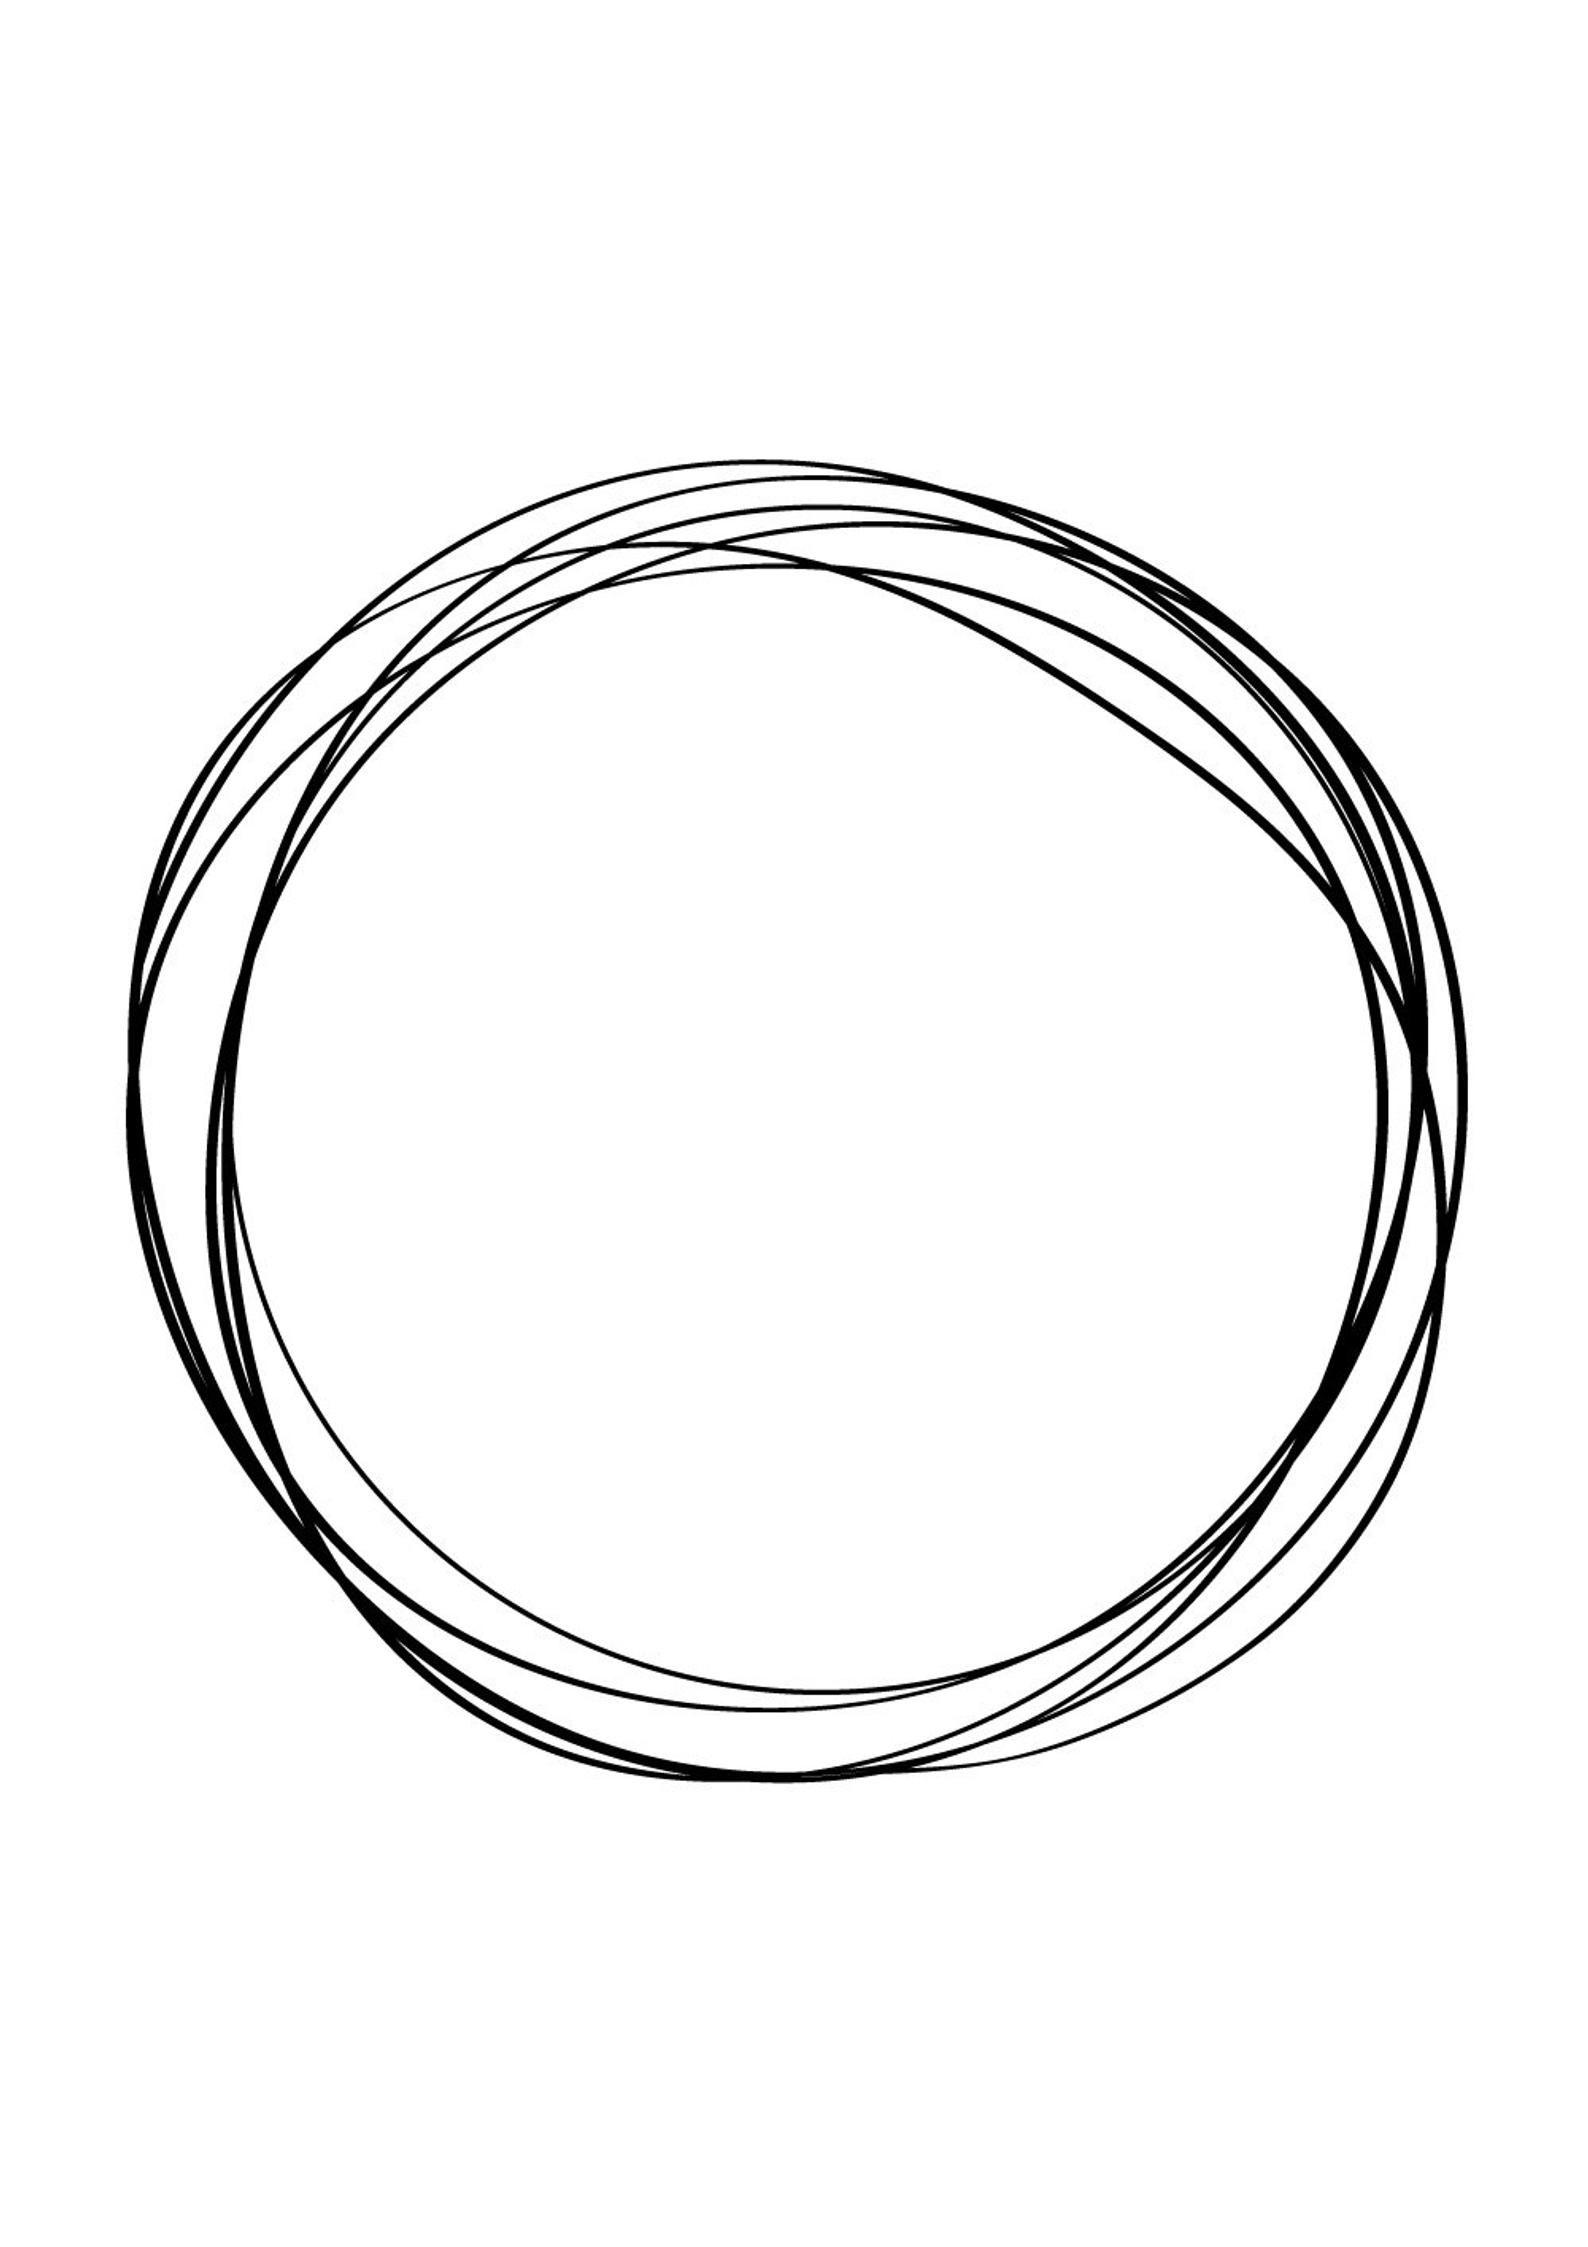 Digital Download Circle Of Life Art Print Scandinavian Print Scandi Design Scandinavian Design Hygge Art Minimalist Circulo De Vida Circulos Png Circulos De Colores